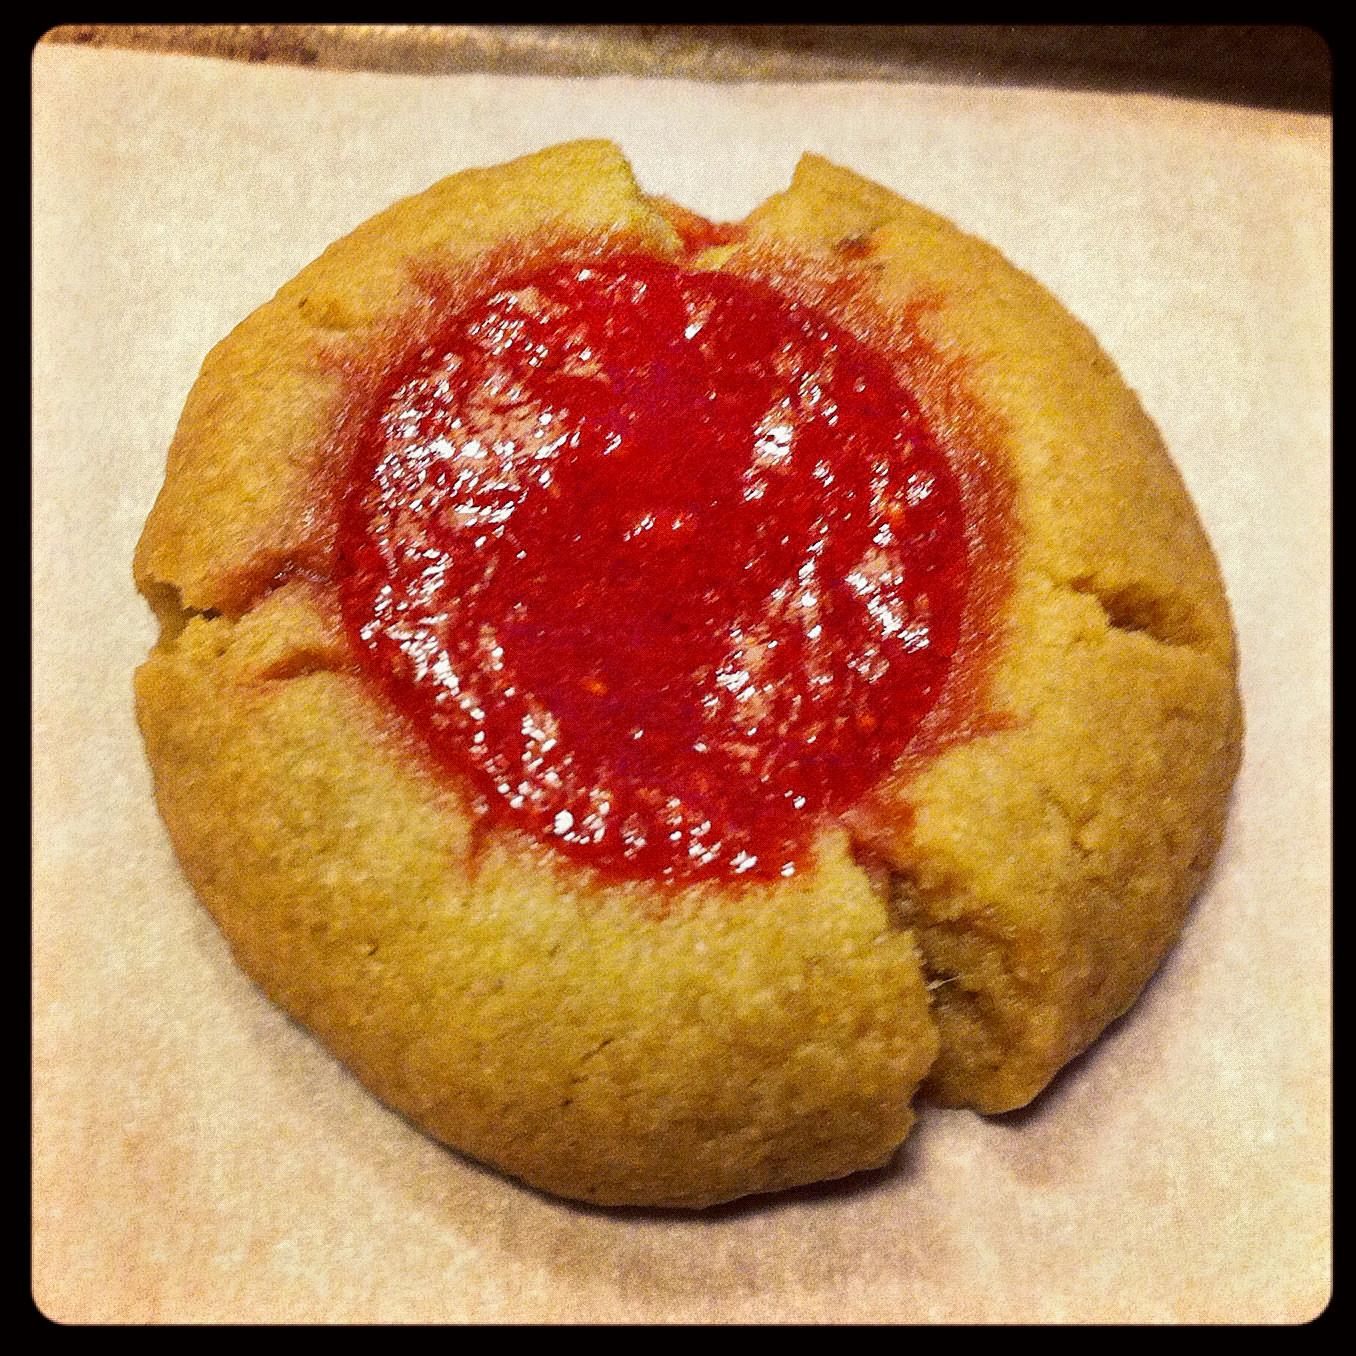 EBL Food Allergies: RECIPE: SunButter® Thumbprint Cookies